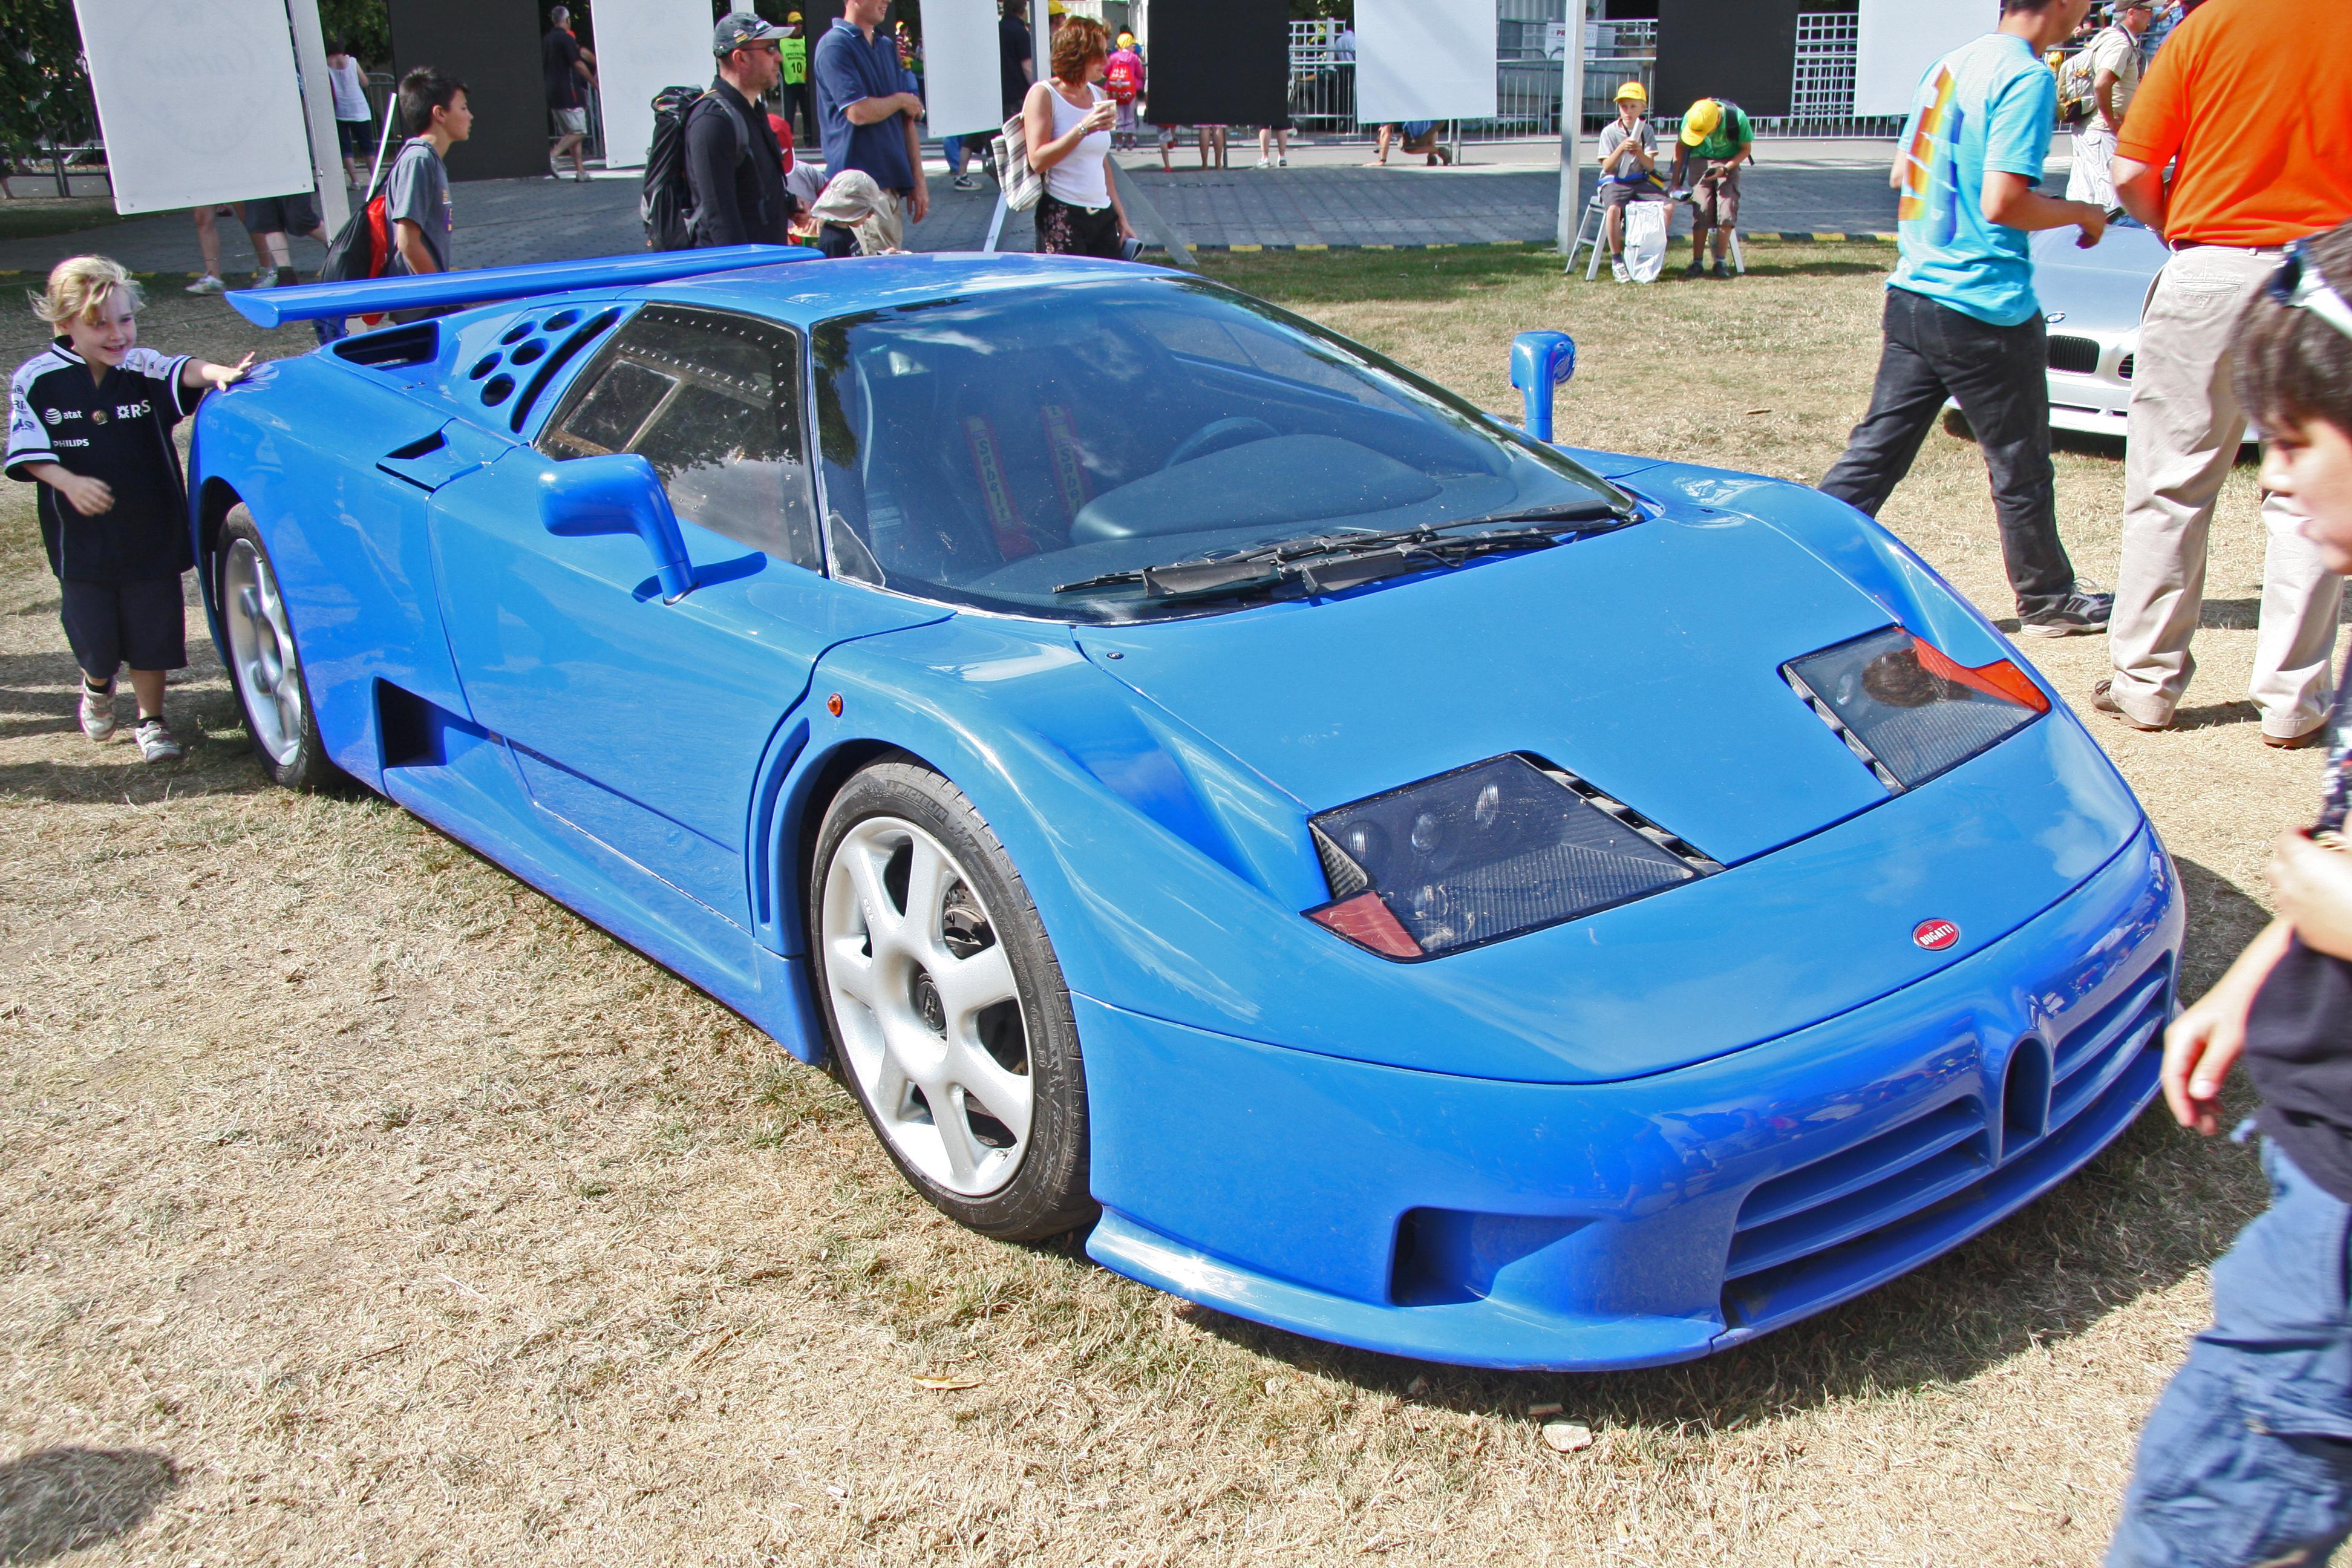 1992BugattioEB110SS Fascinating Gran Turismo Psp Bugatti Veyron Price Cars Trend